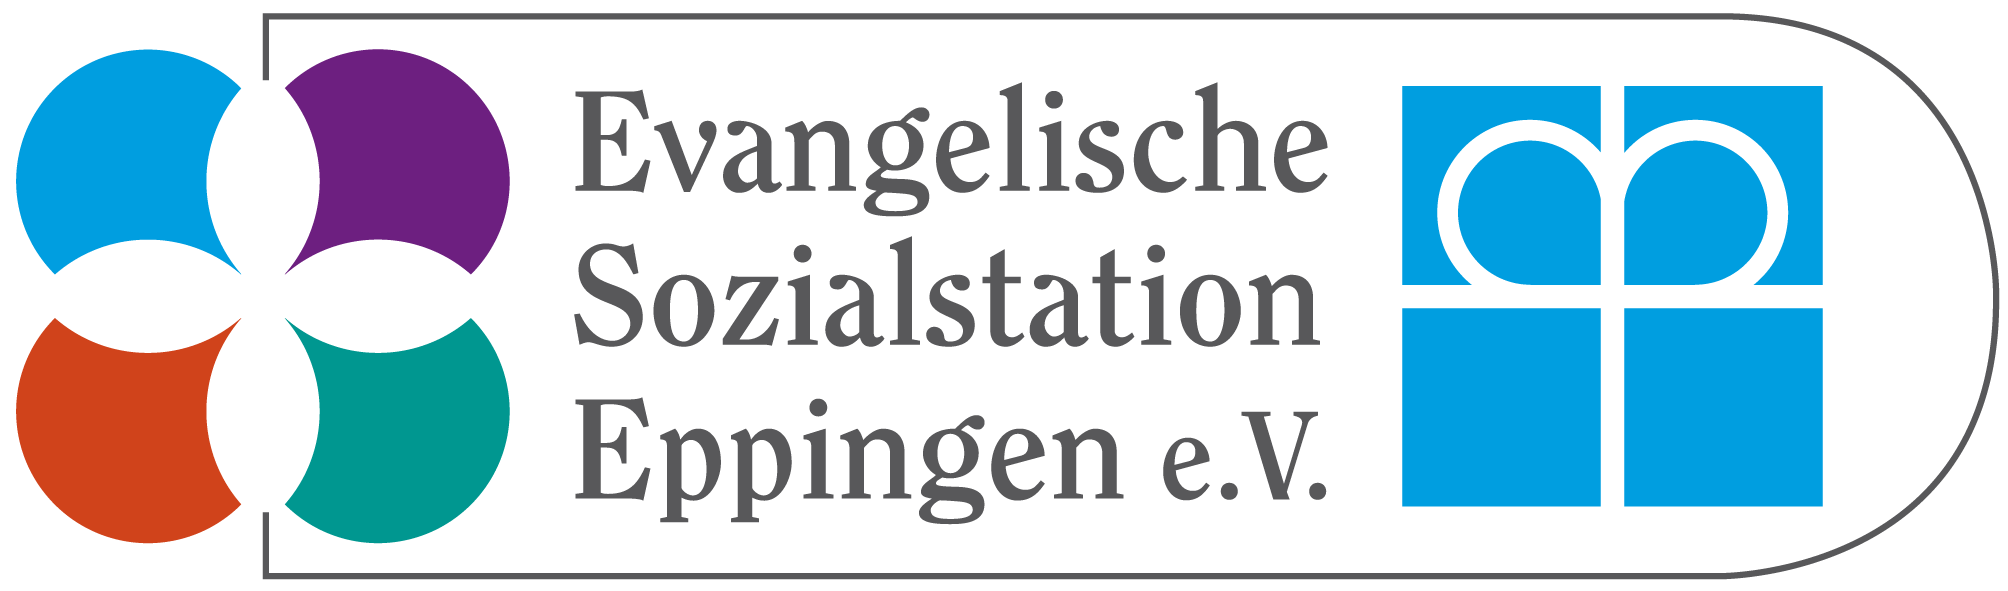 Logo Evangelische Sozialstation Eppingen e.V.